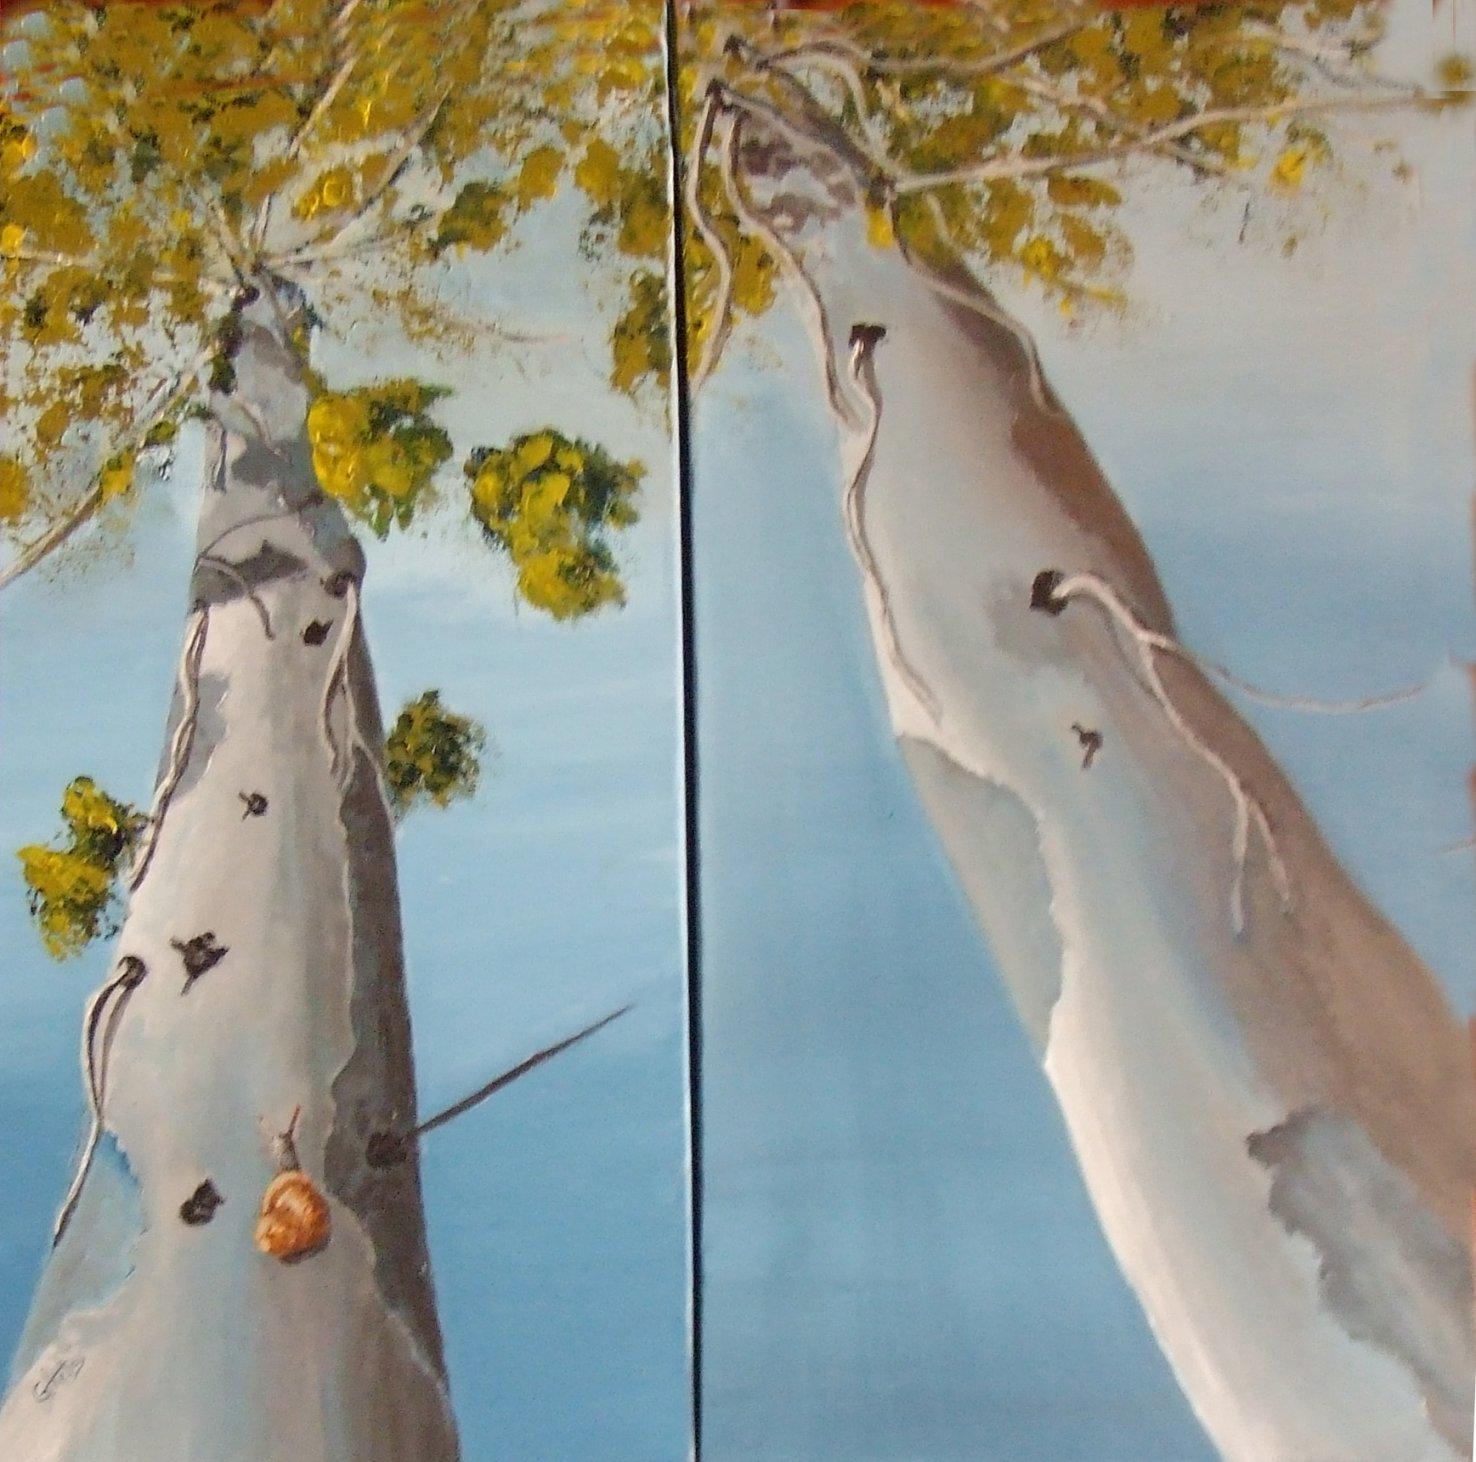 NATURAL - MENTE XXIII (2015) - Geles Conesa - G.Artés